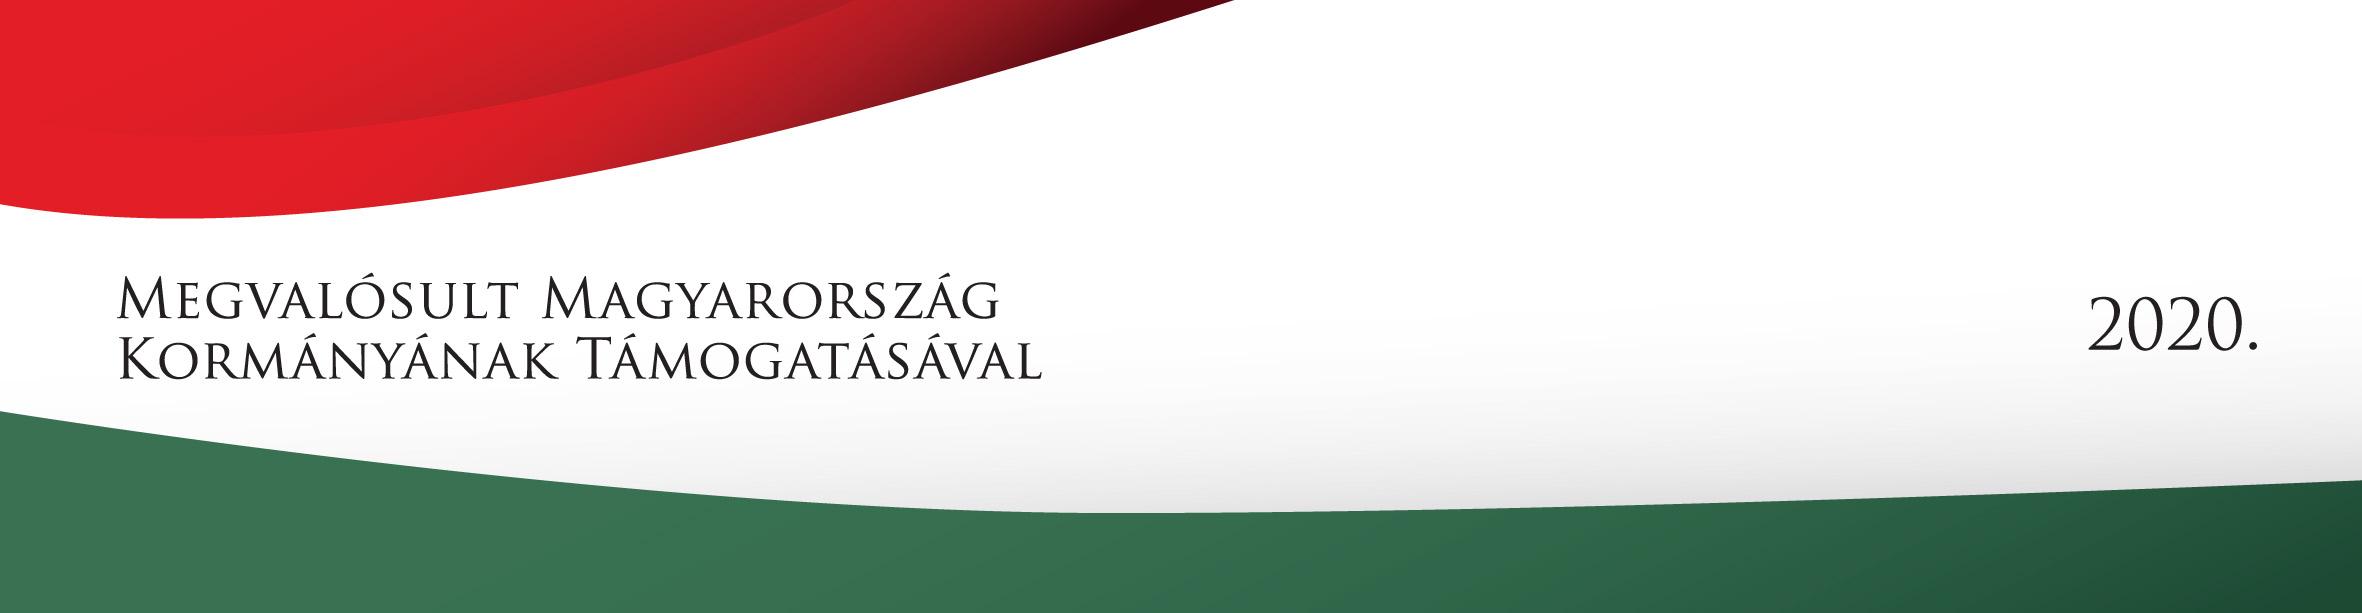 megvalosult_magyarorszag_kormanyanak_tamogatasaval_2020